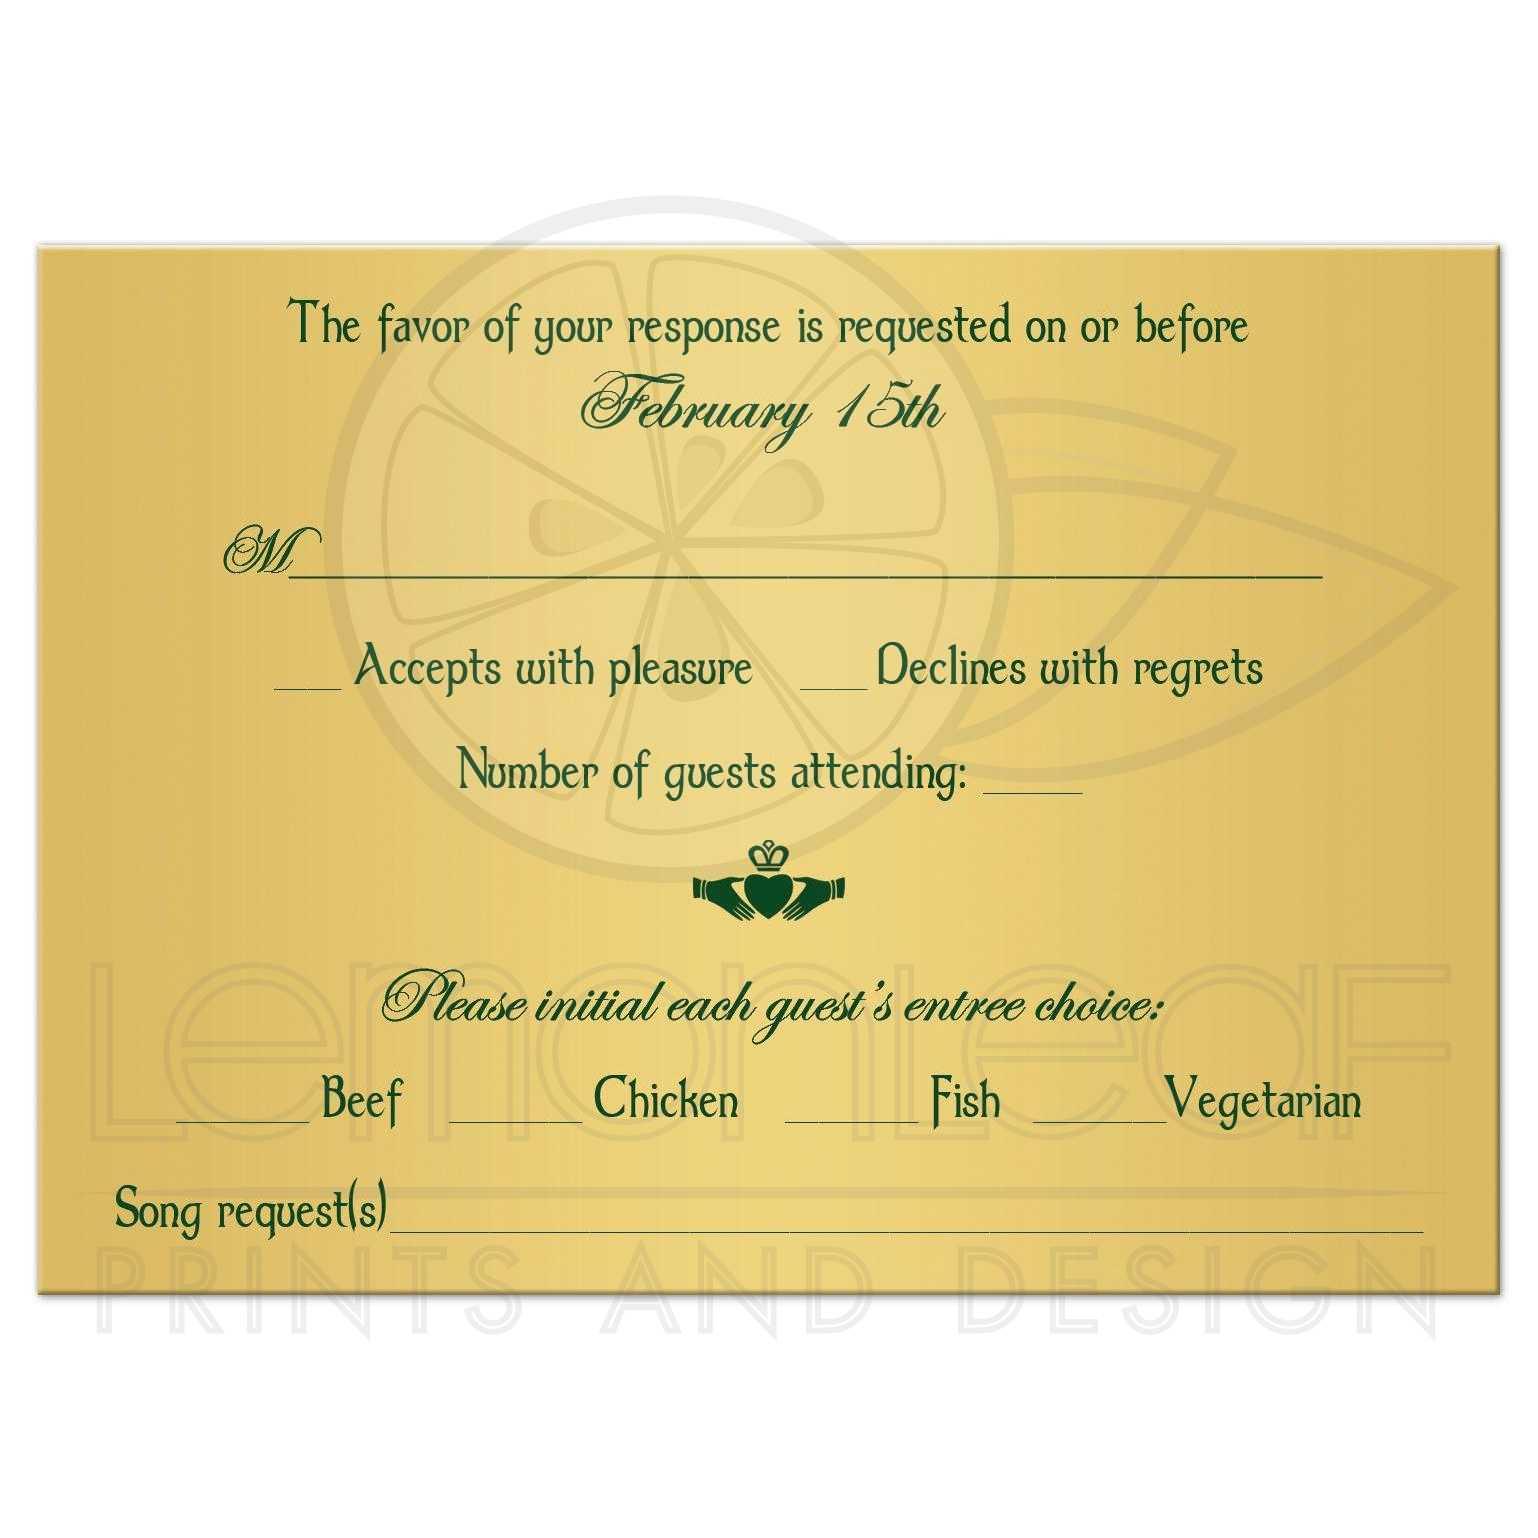 Assorted Green Intricate Celtic Wedding Rsvp Card G Floral Claddagh Rsvp Card Wedding Wording Ny Wedding Rsvp Cards G Irish Or Celtic Wedding Rsvp Enclosure Card Insert Withg Claddagh wedding Rsvp Cards Wedding